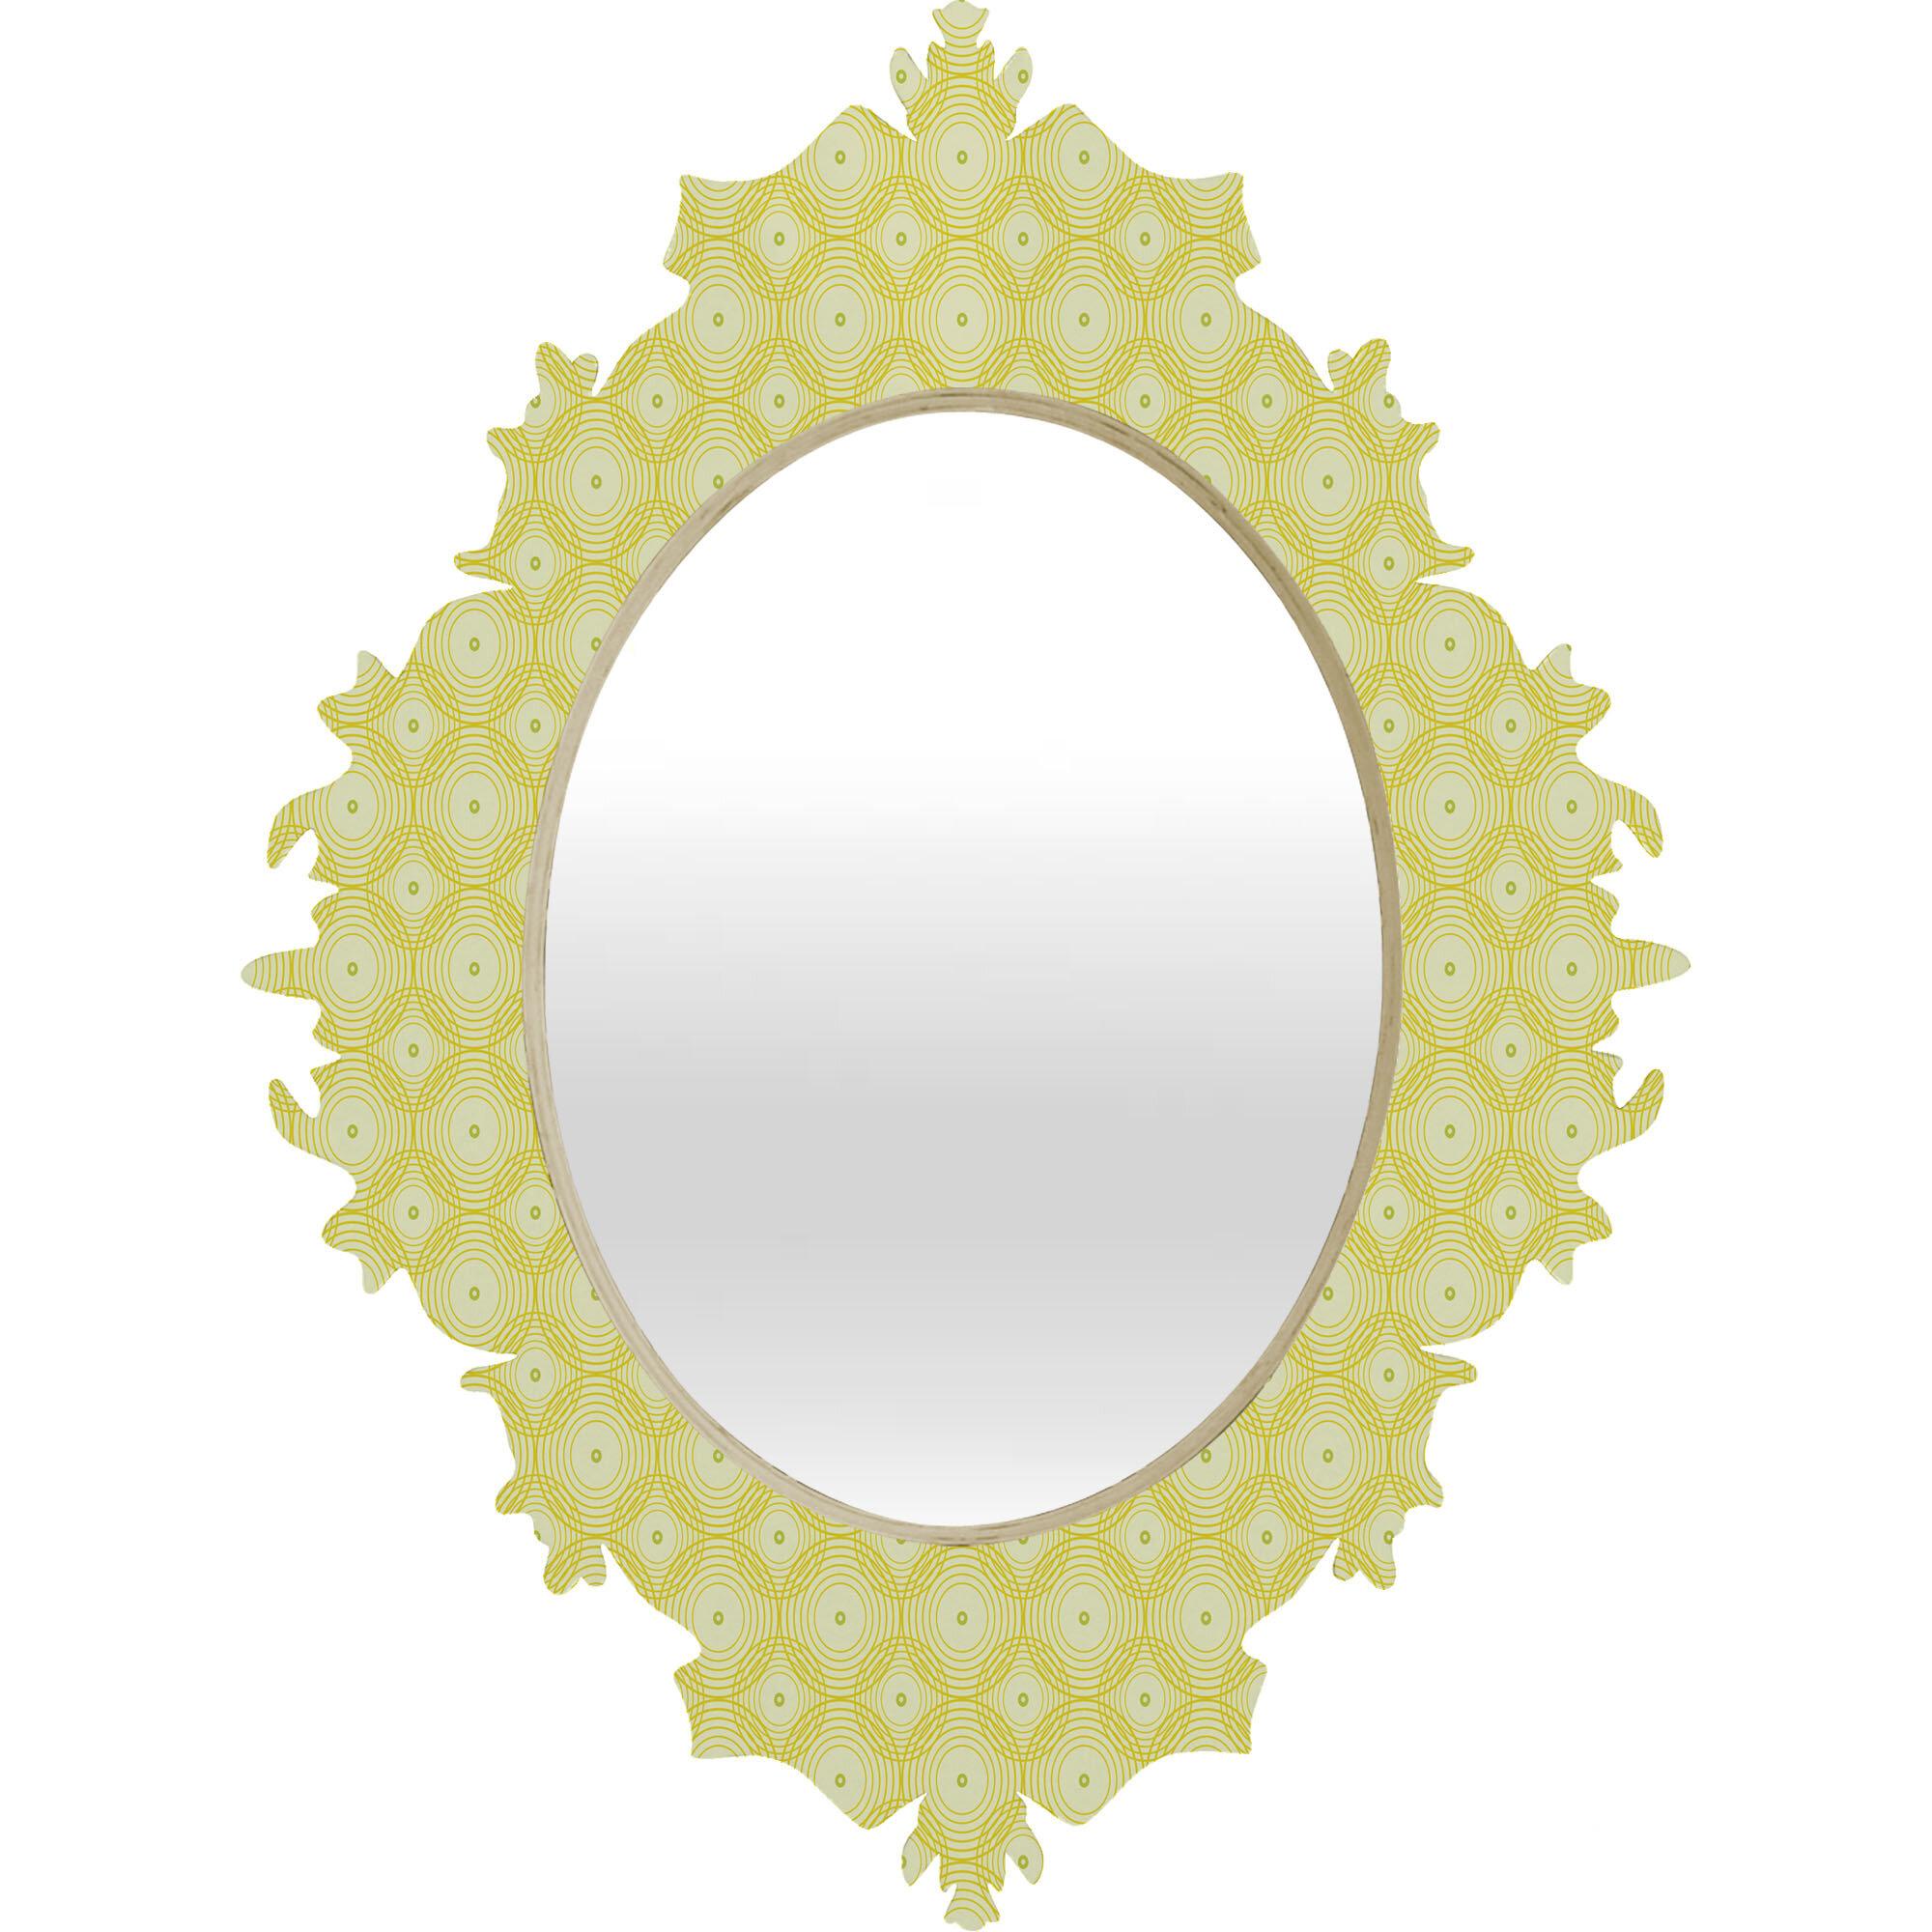 East Urban Home Spirals Baroque Accent Mirror | Wayfair